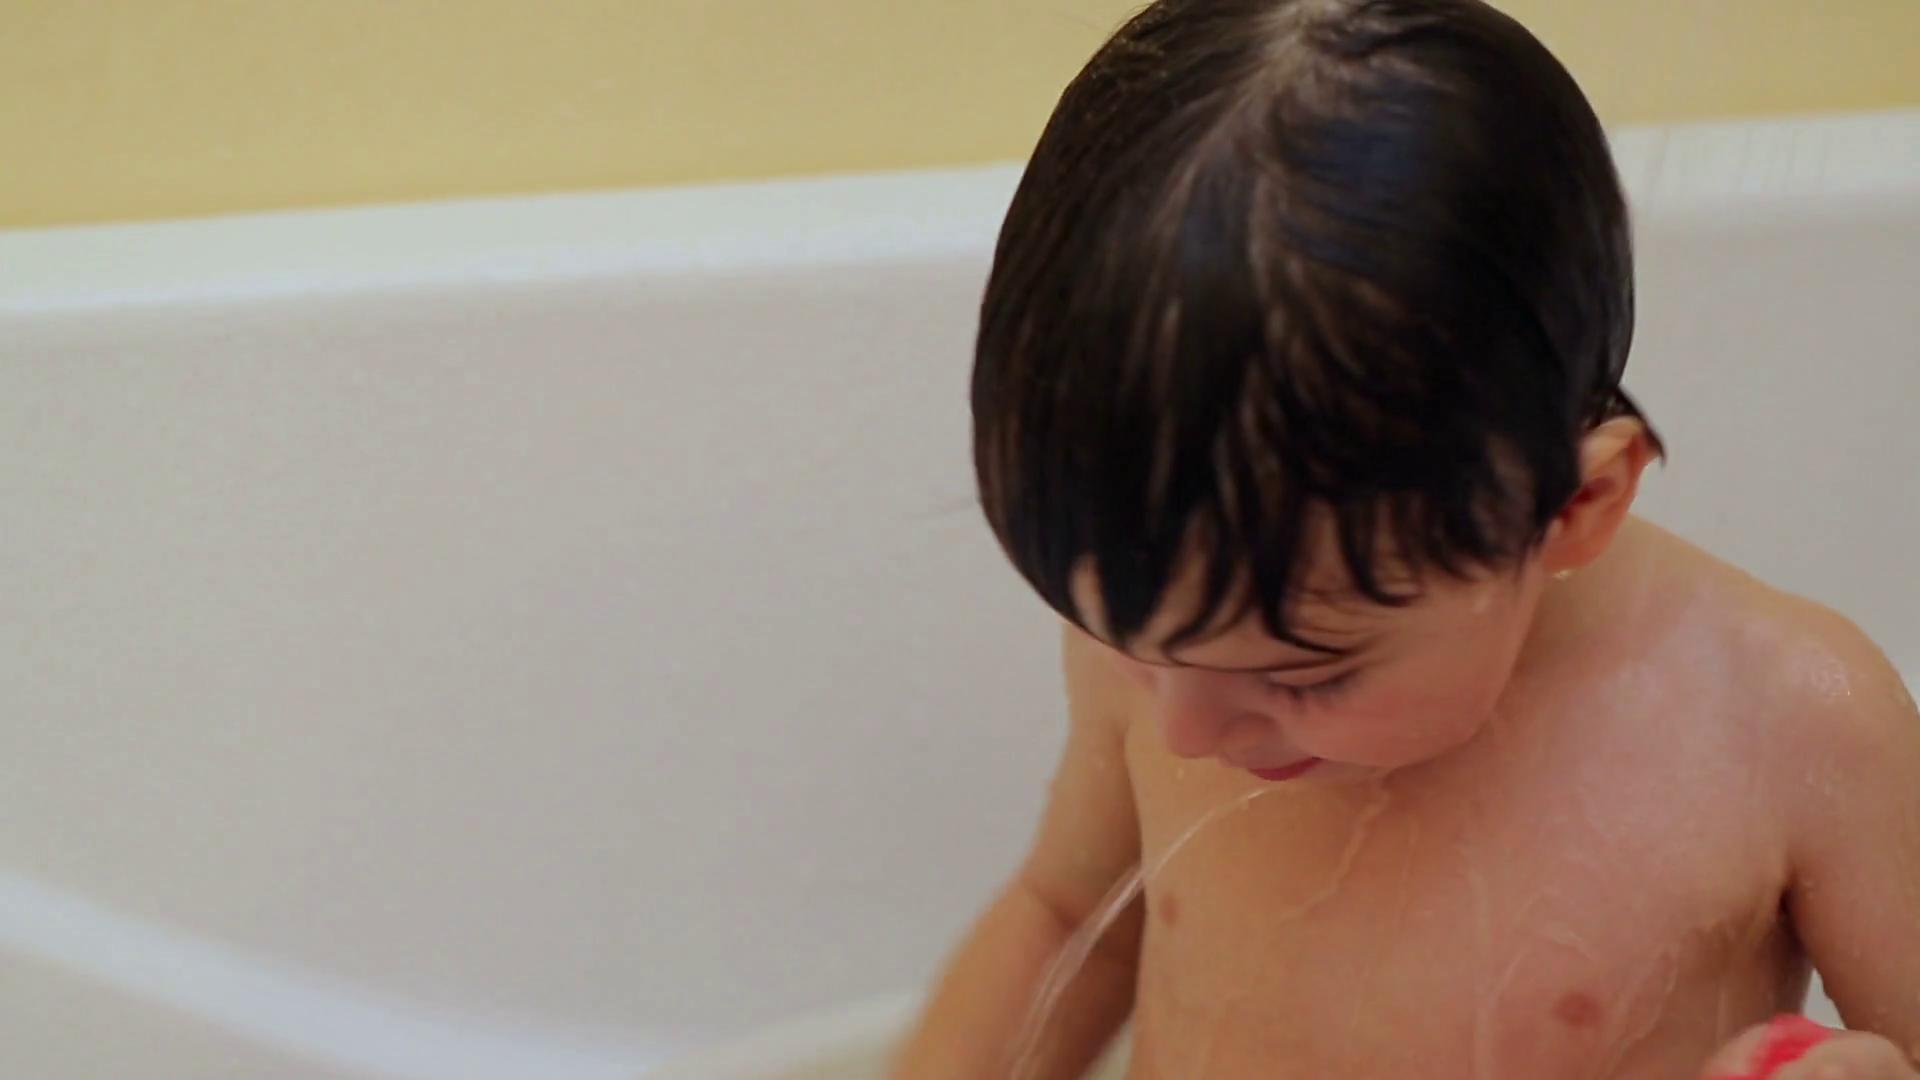 Emotional little boy taking a bath alone.  Stock Video Footage - Storyblocks